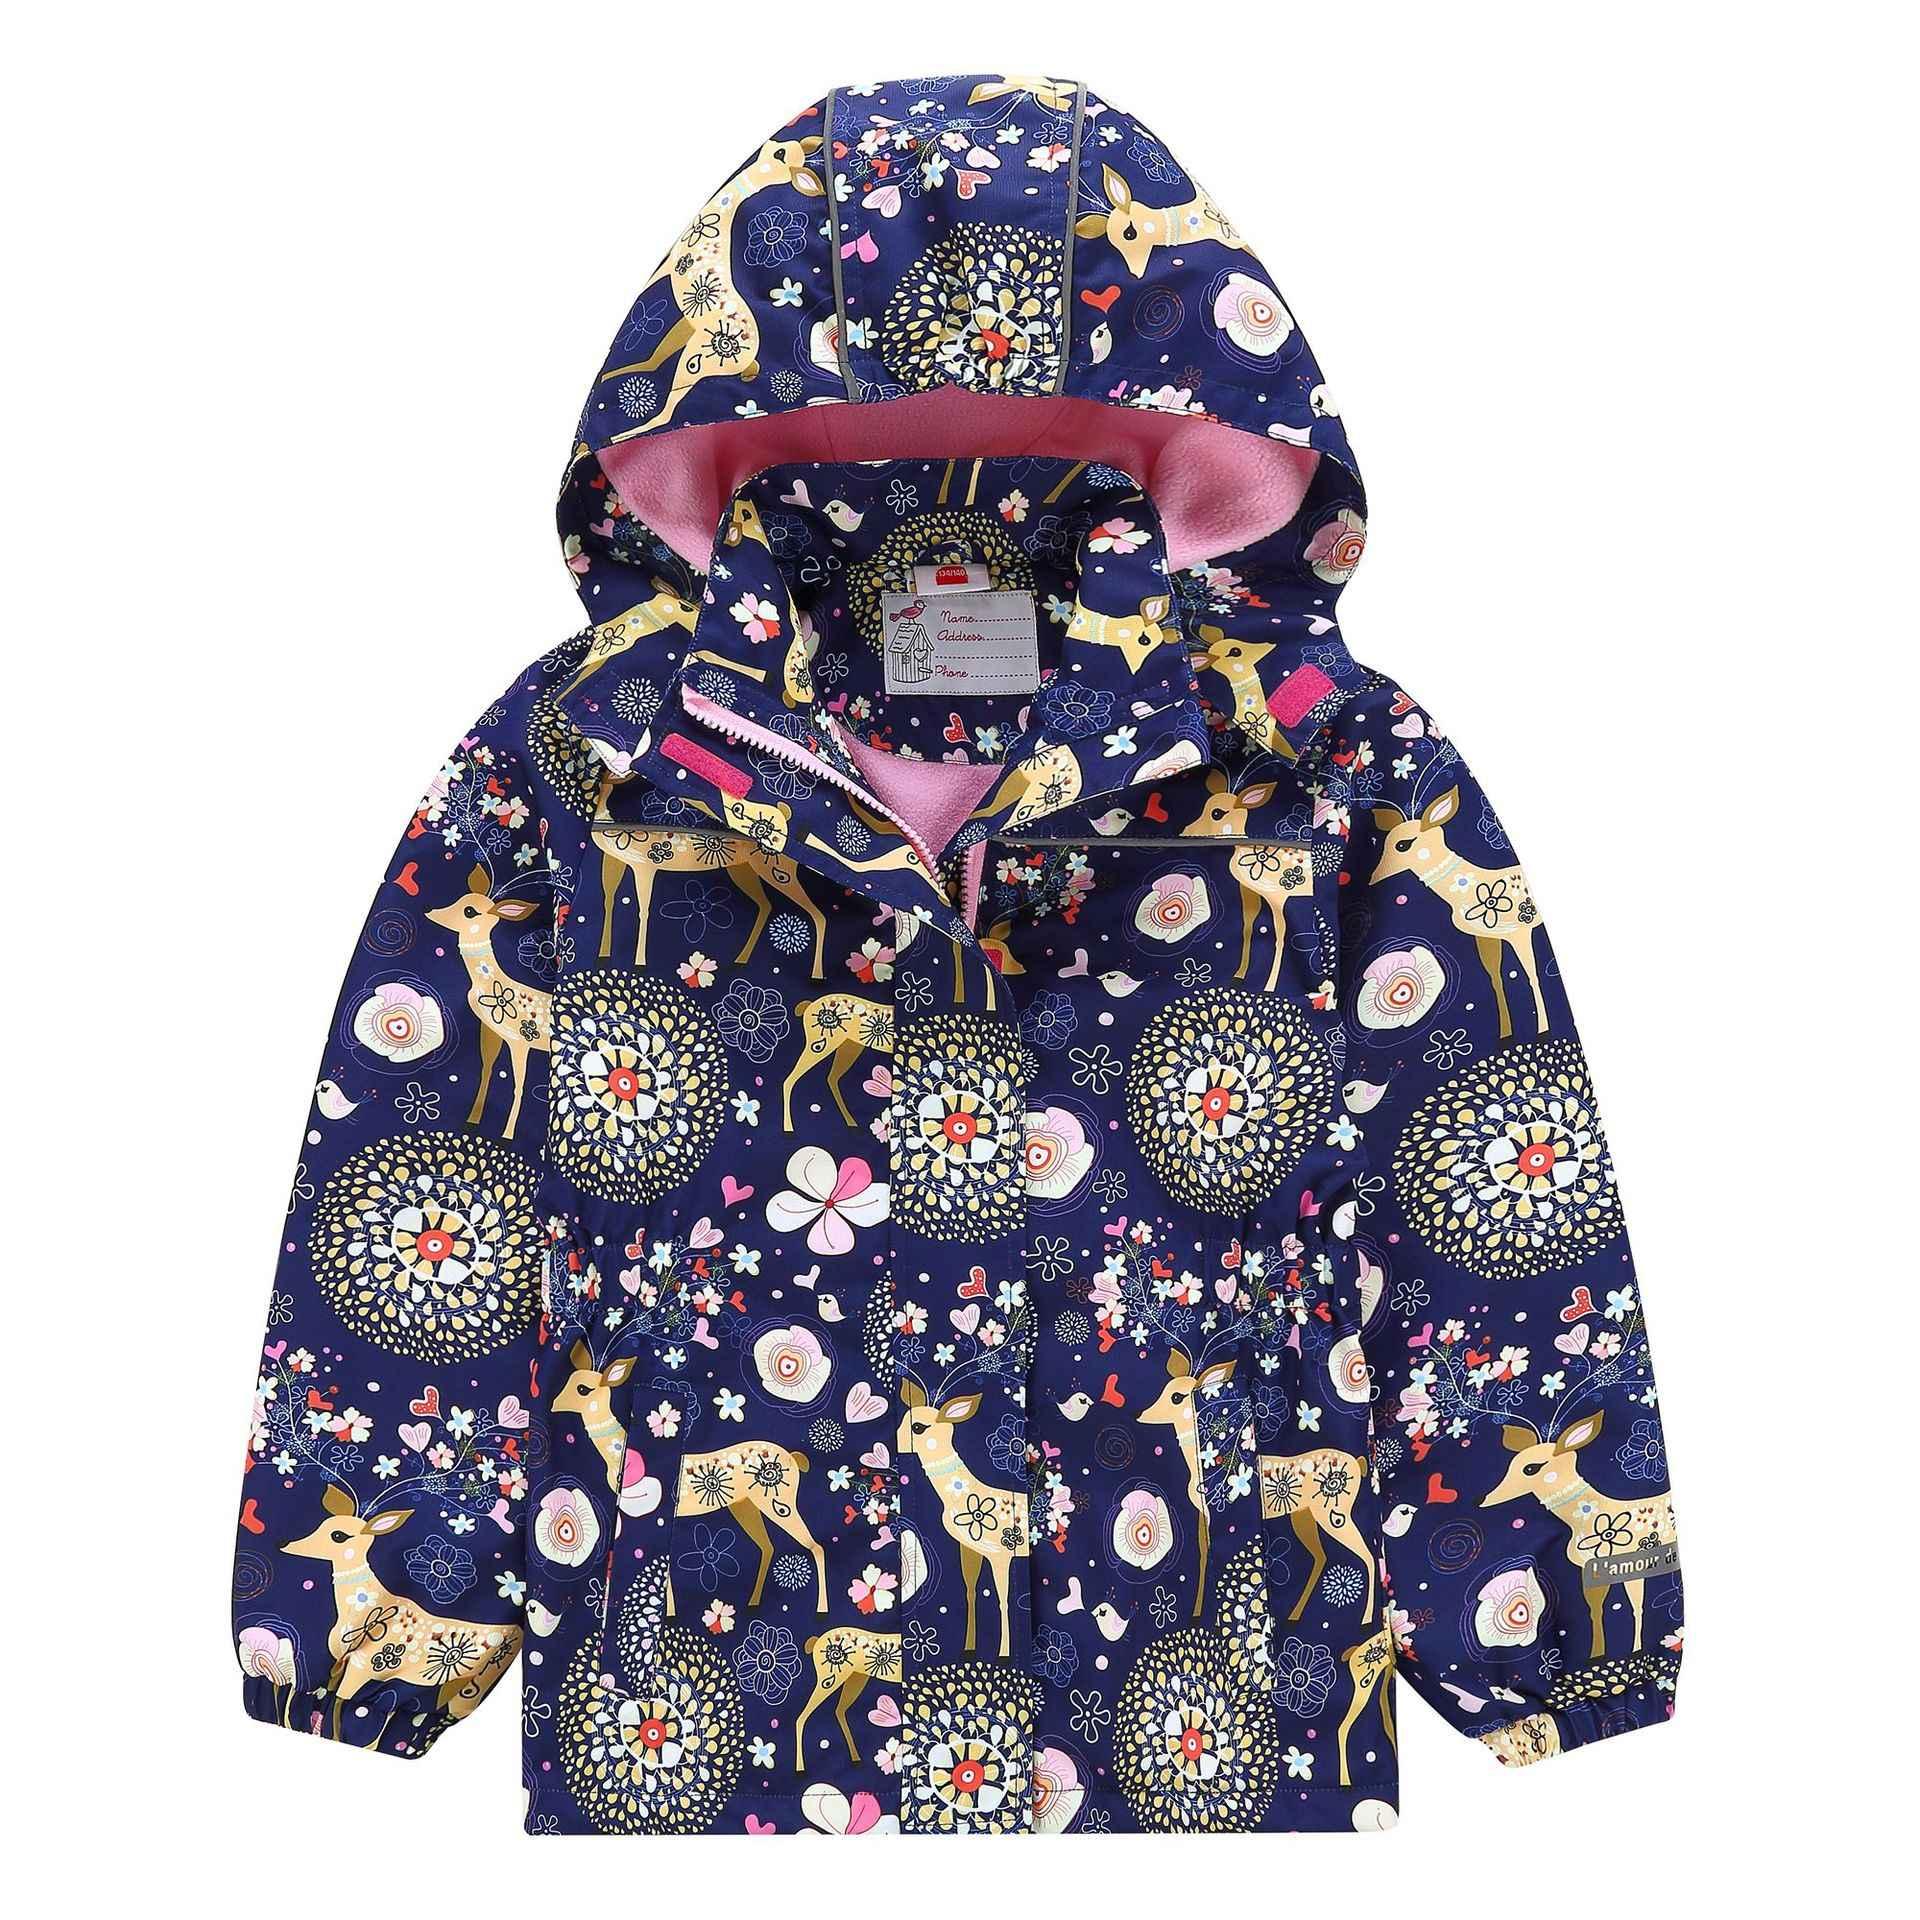 HSSCZL בנות מעילי 2019 אביב חדש סתיו ילדה ילדי תינוק תינוקות windproof עמיד למים מעיל ילדים של ברדס מעיל הלבשה עליונה